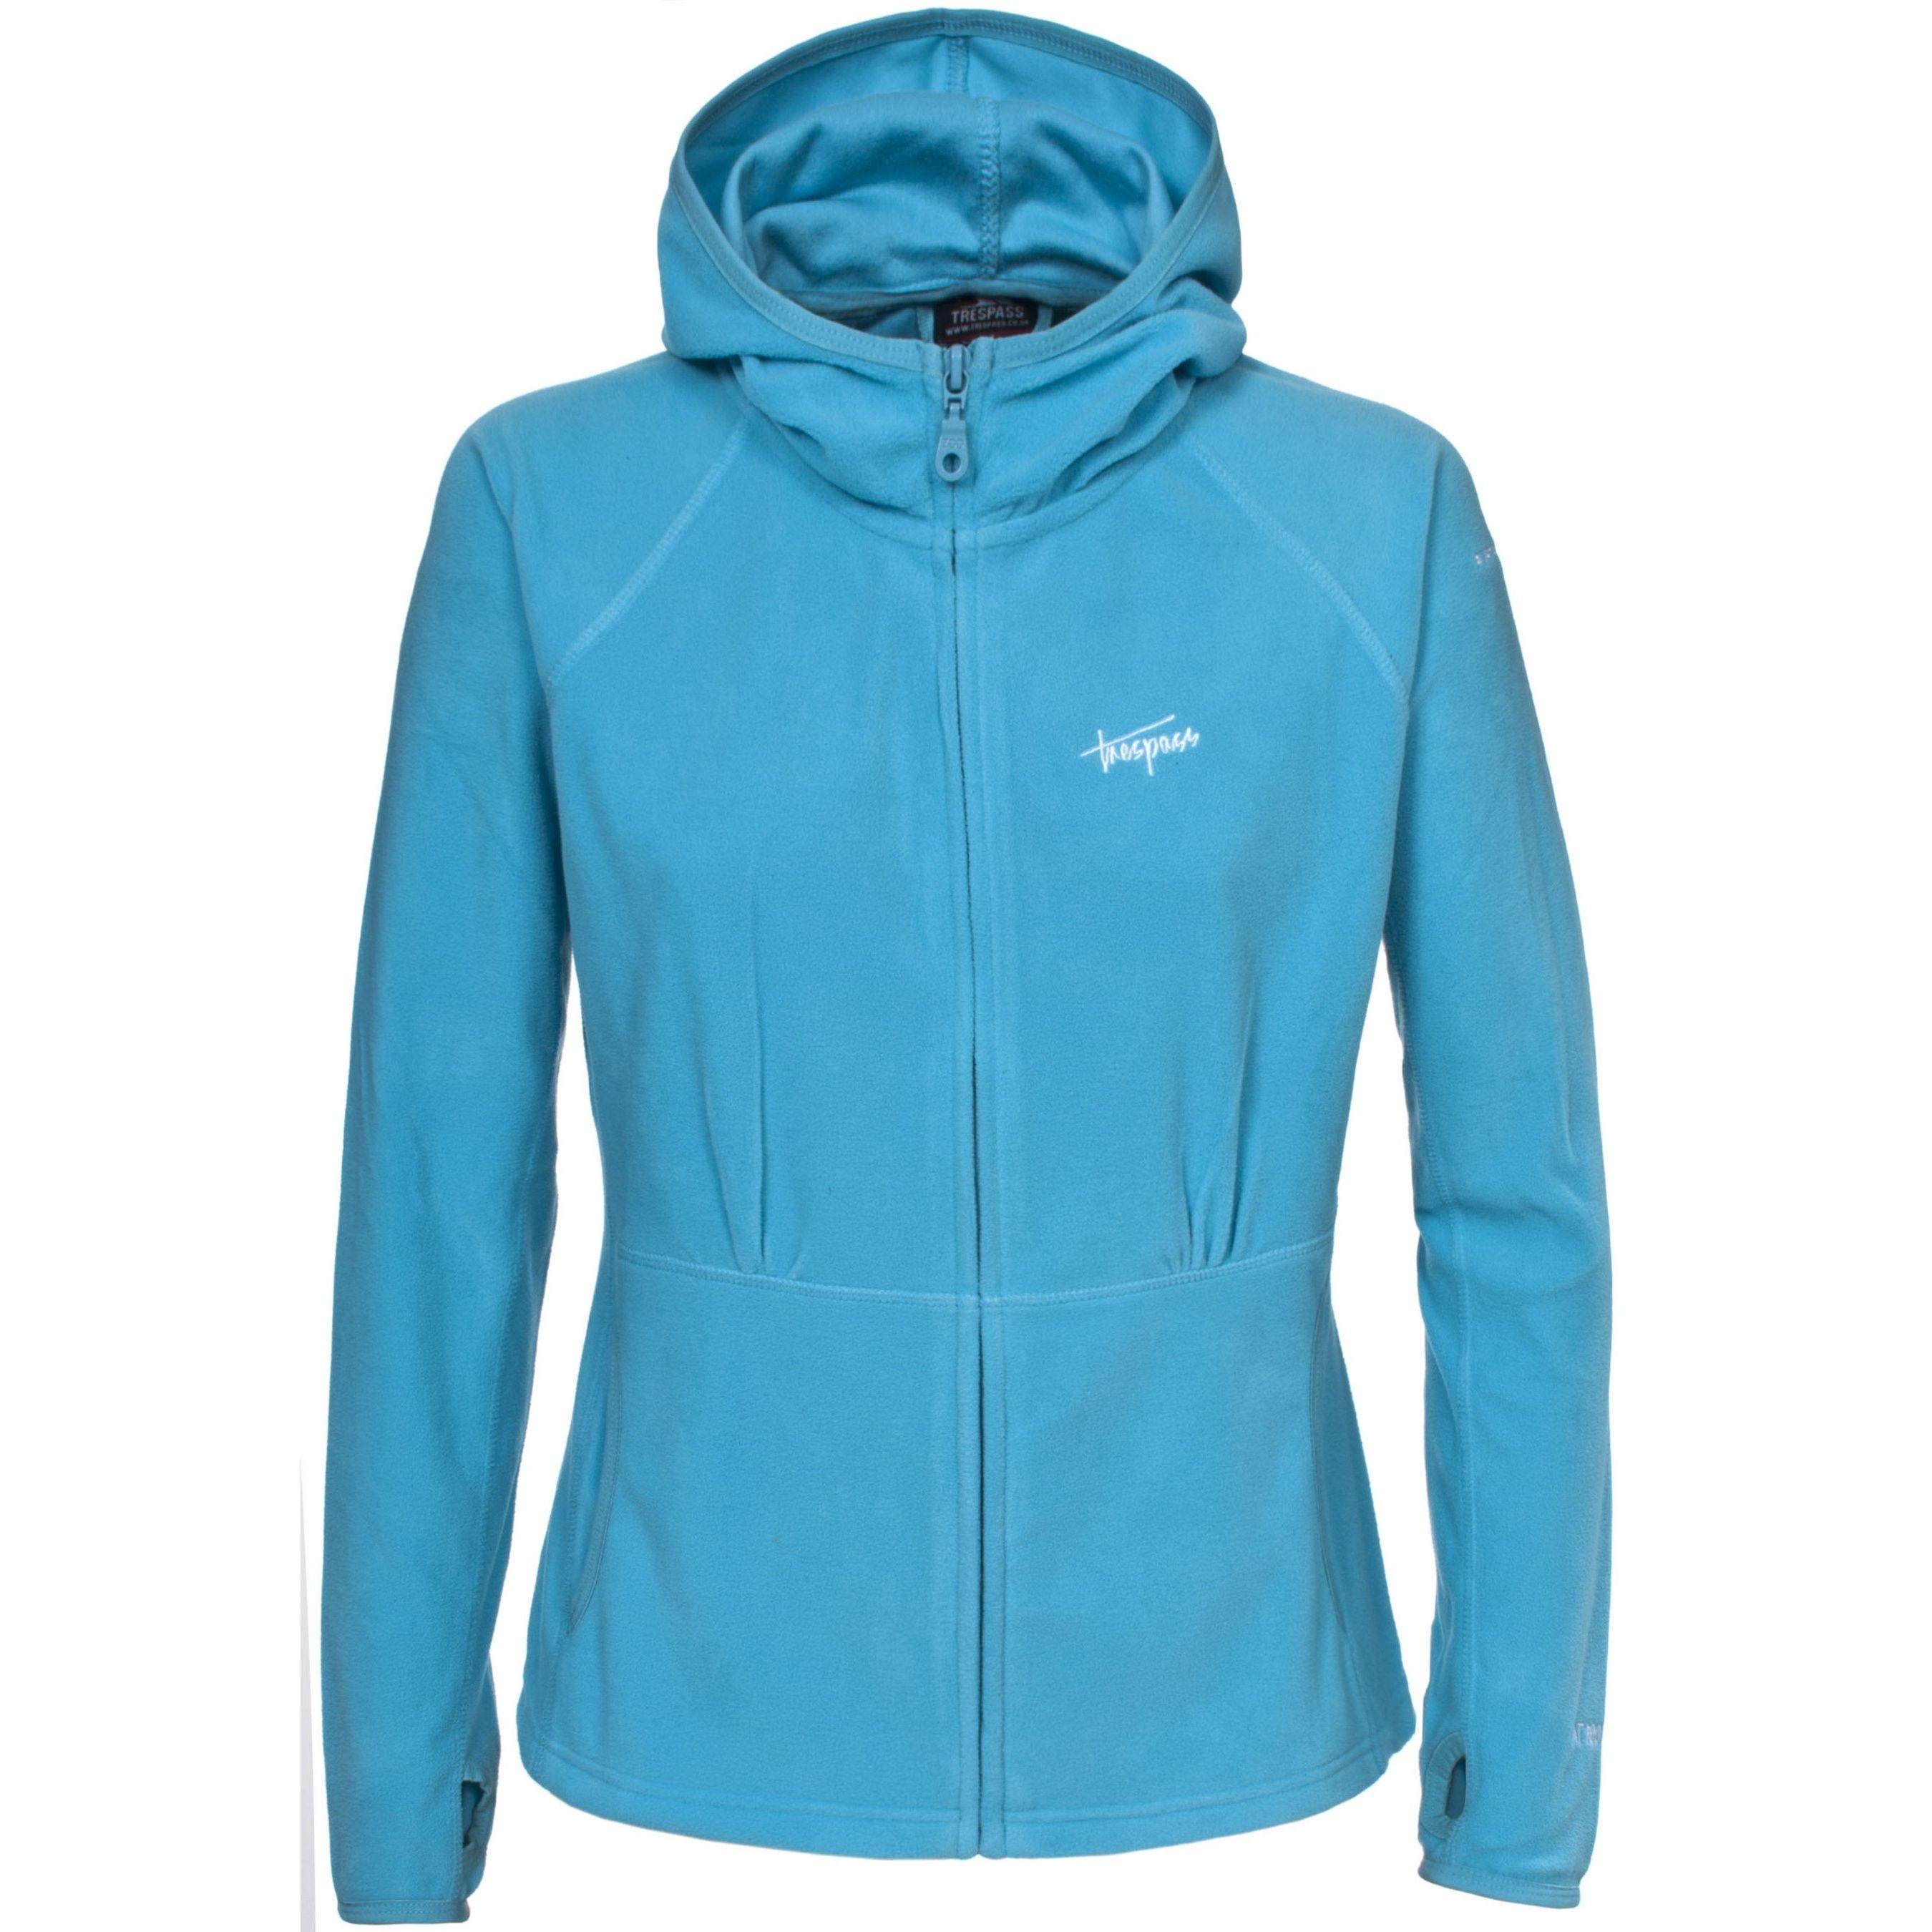 Trespass Womens/Ladies Marathon Hooded Full Zip Fleece Jacket